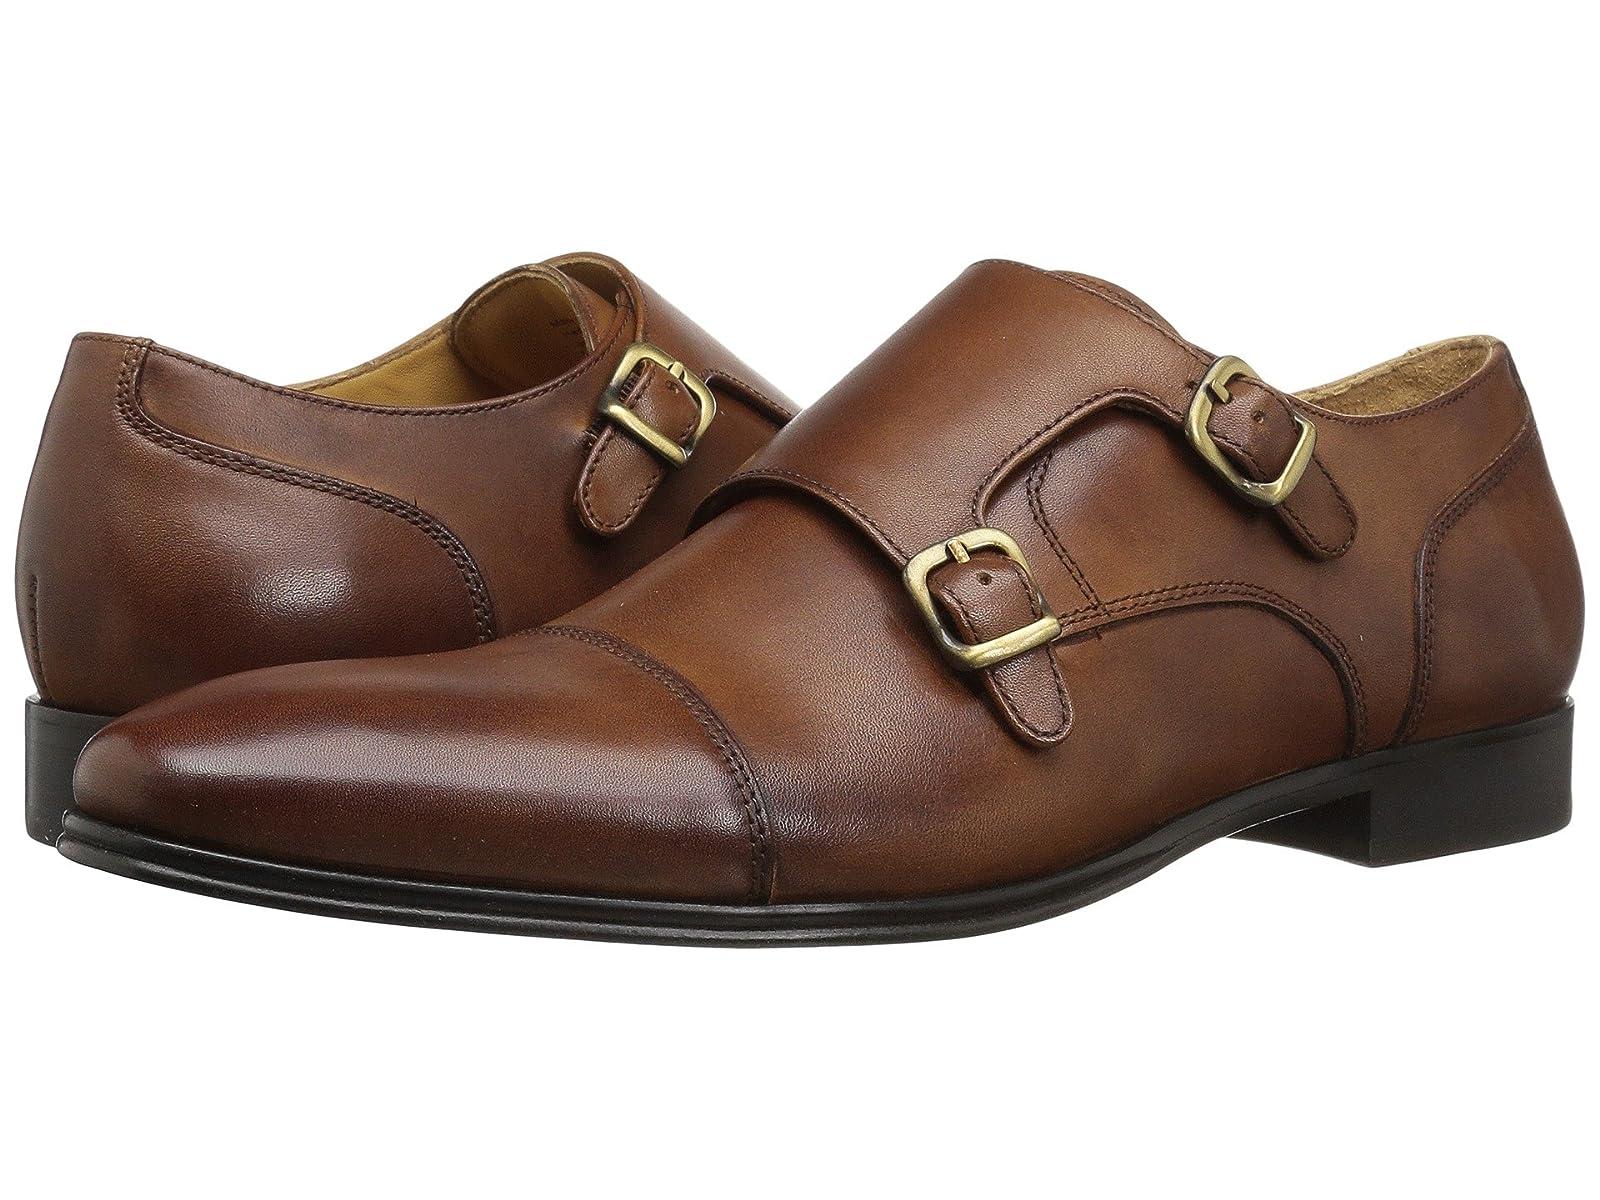 ALDO RizzaldaAtmospheric grades have affordable shoes